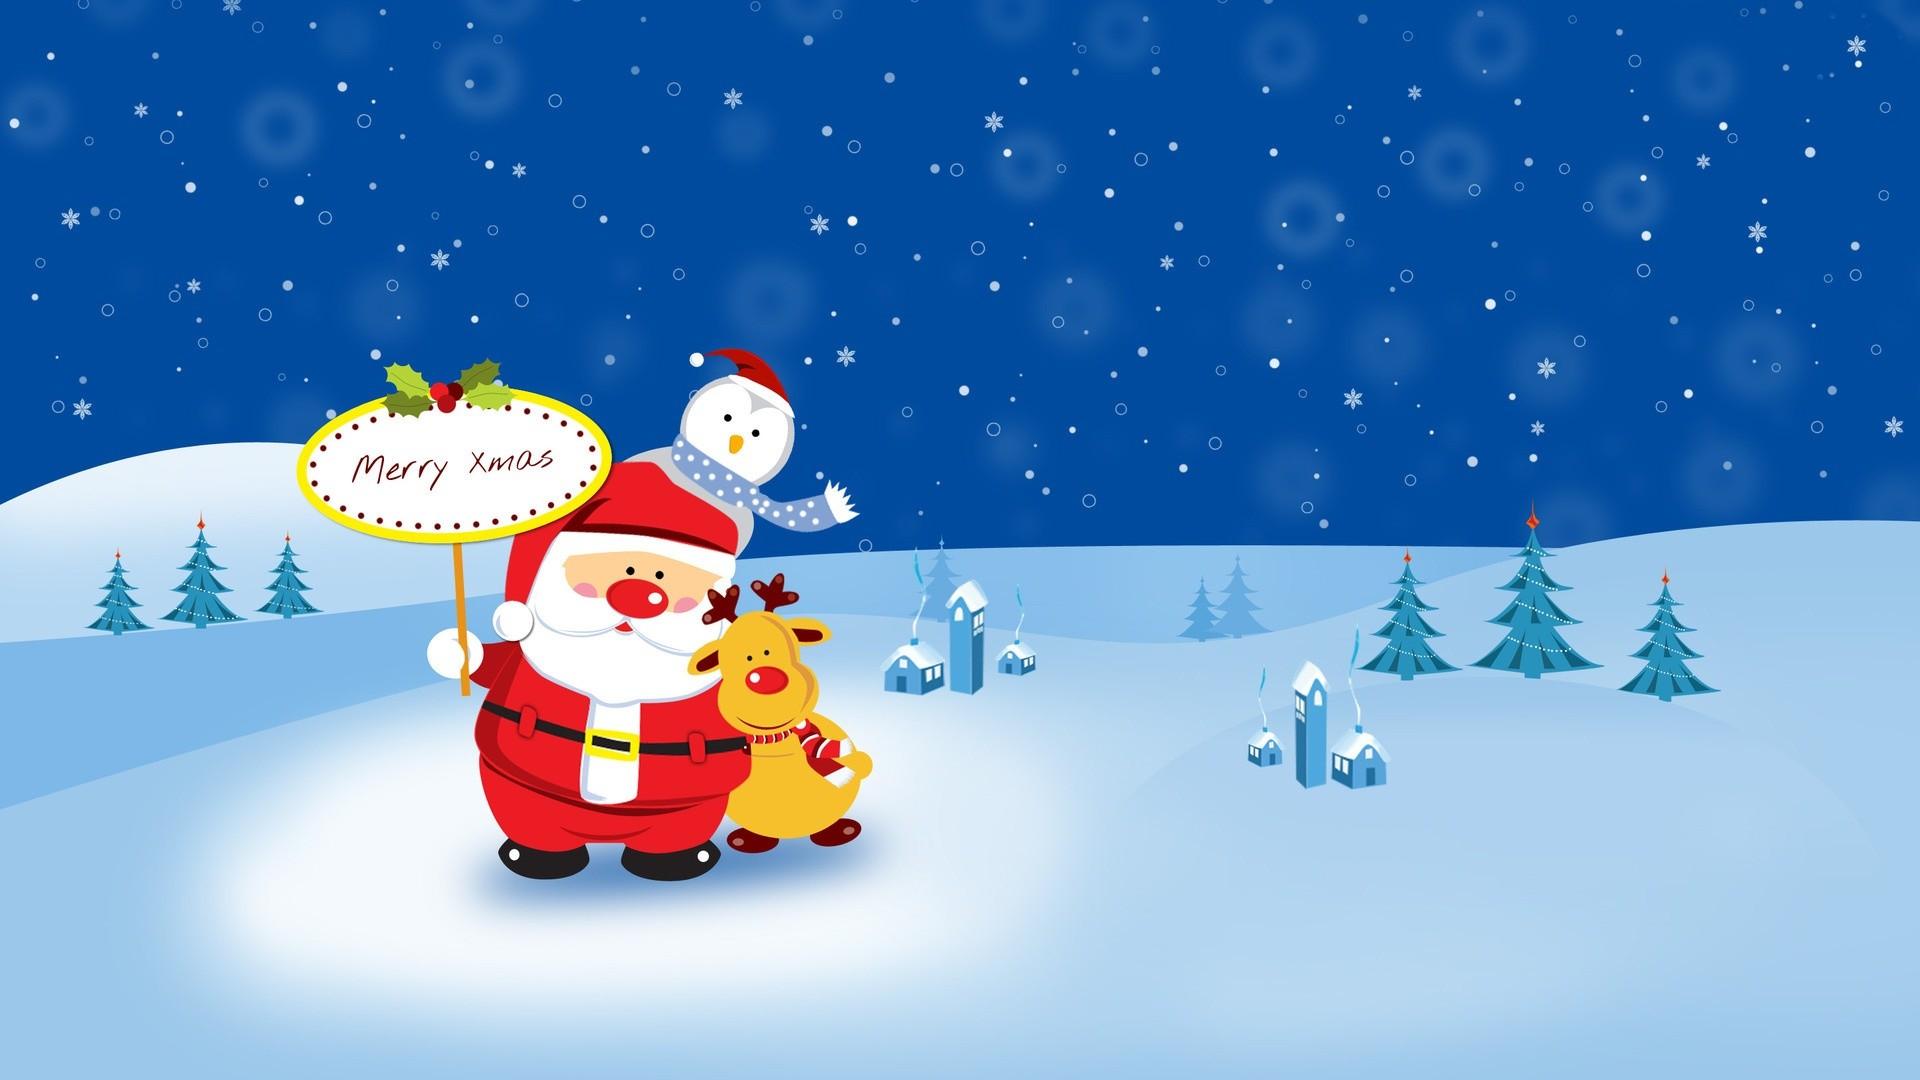 1920x1080, Animated Christmas Wallpaper   Data Id 36101 - Cute Animated Christmas Backgrounds - HD Wallpaper